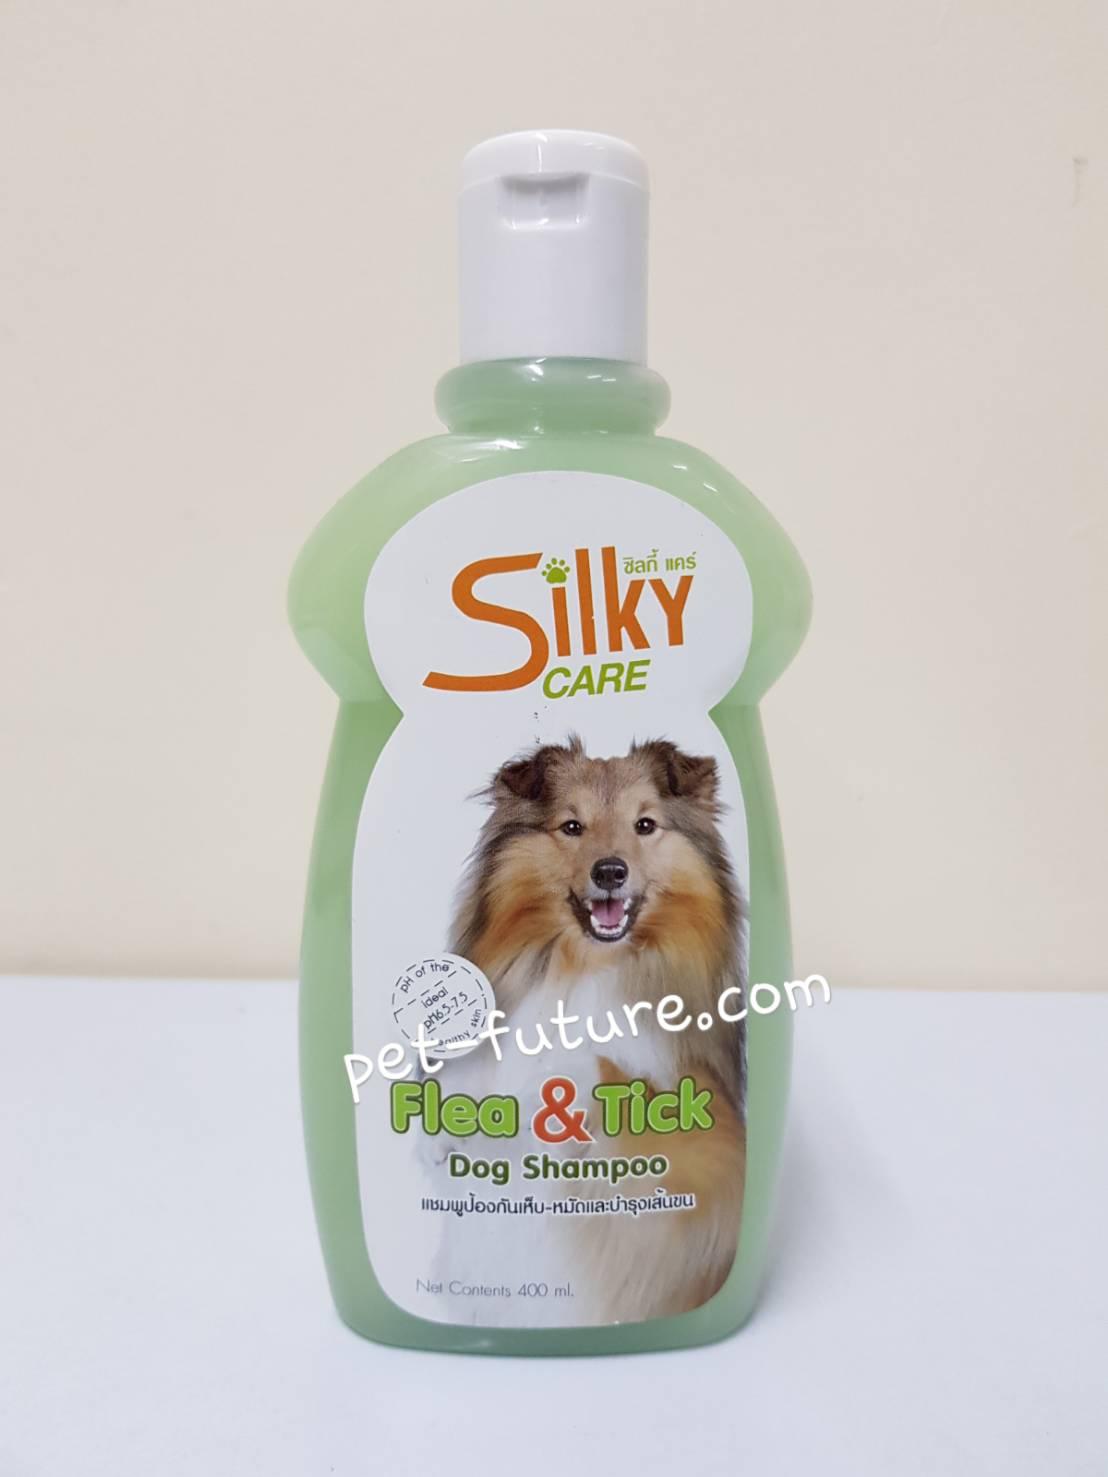 Silky Care Flea & Tick Dog Shampoo ขนาด 400 มล.แชมพูป้องกันเห็บ-หมัดและบำรุงเส้นขน